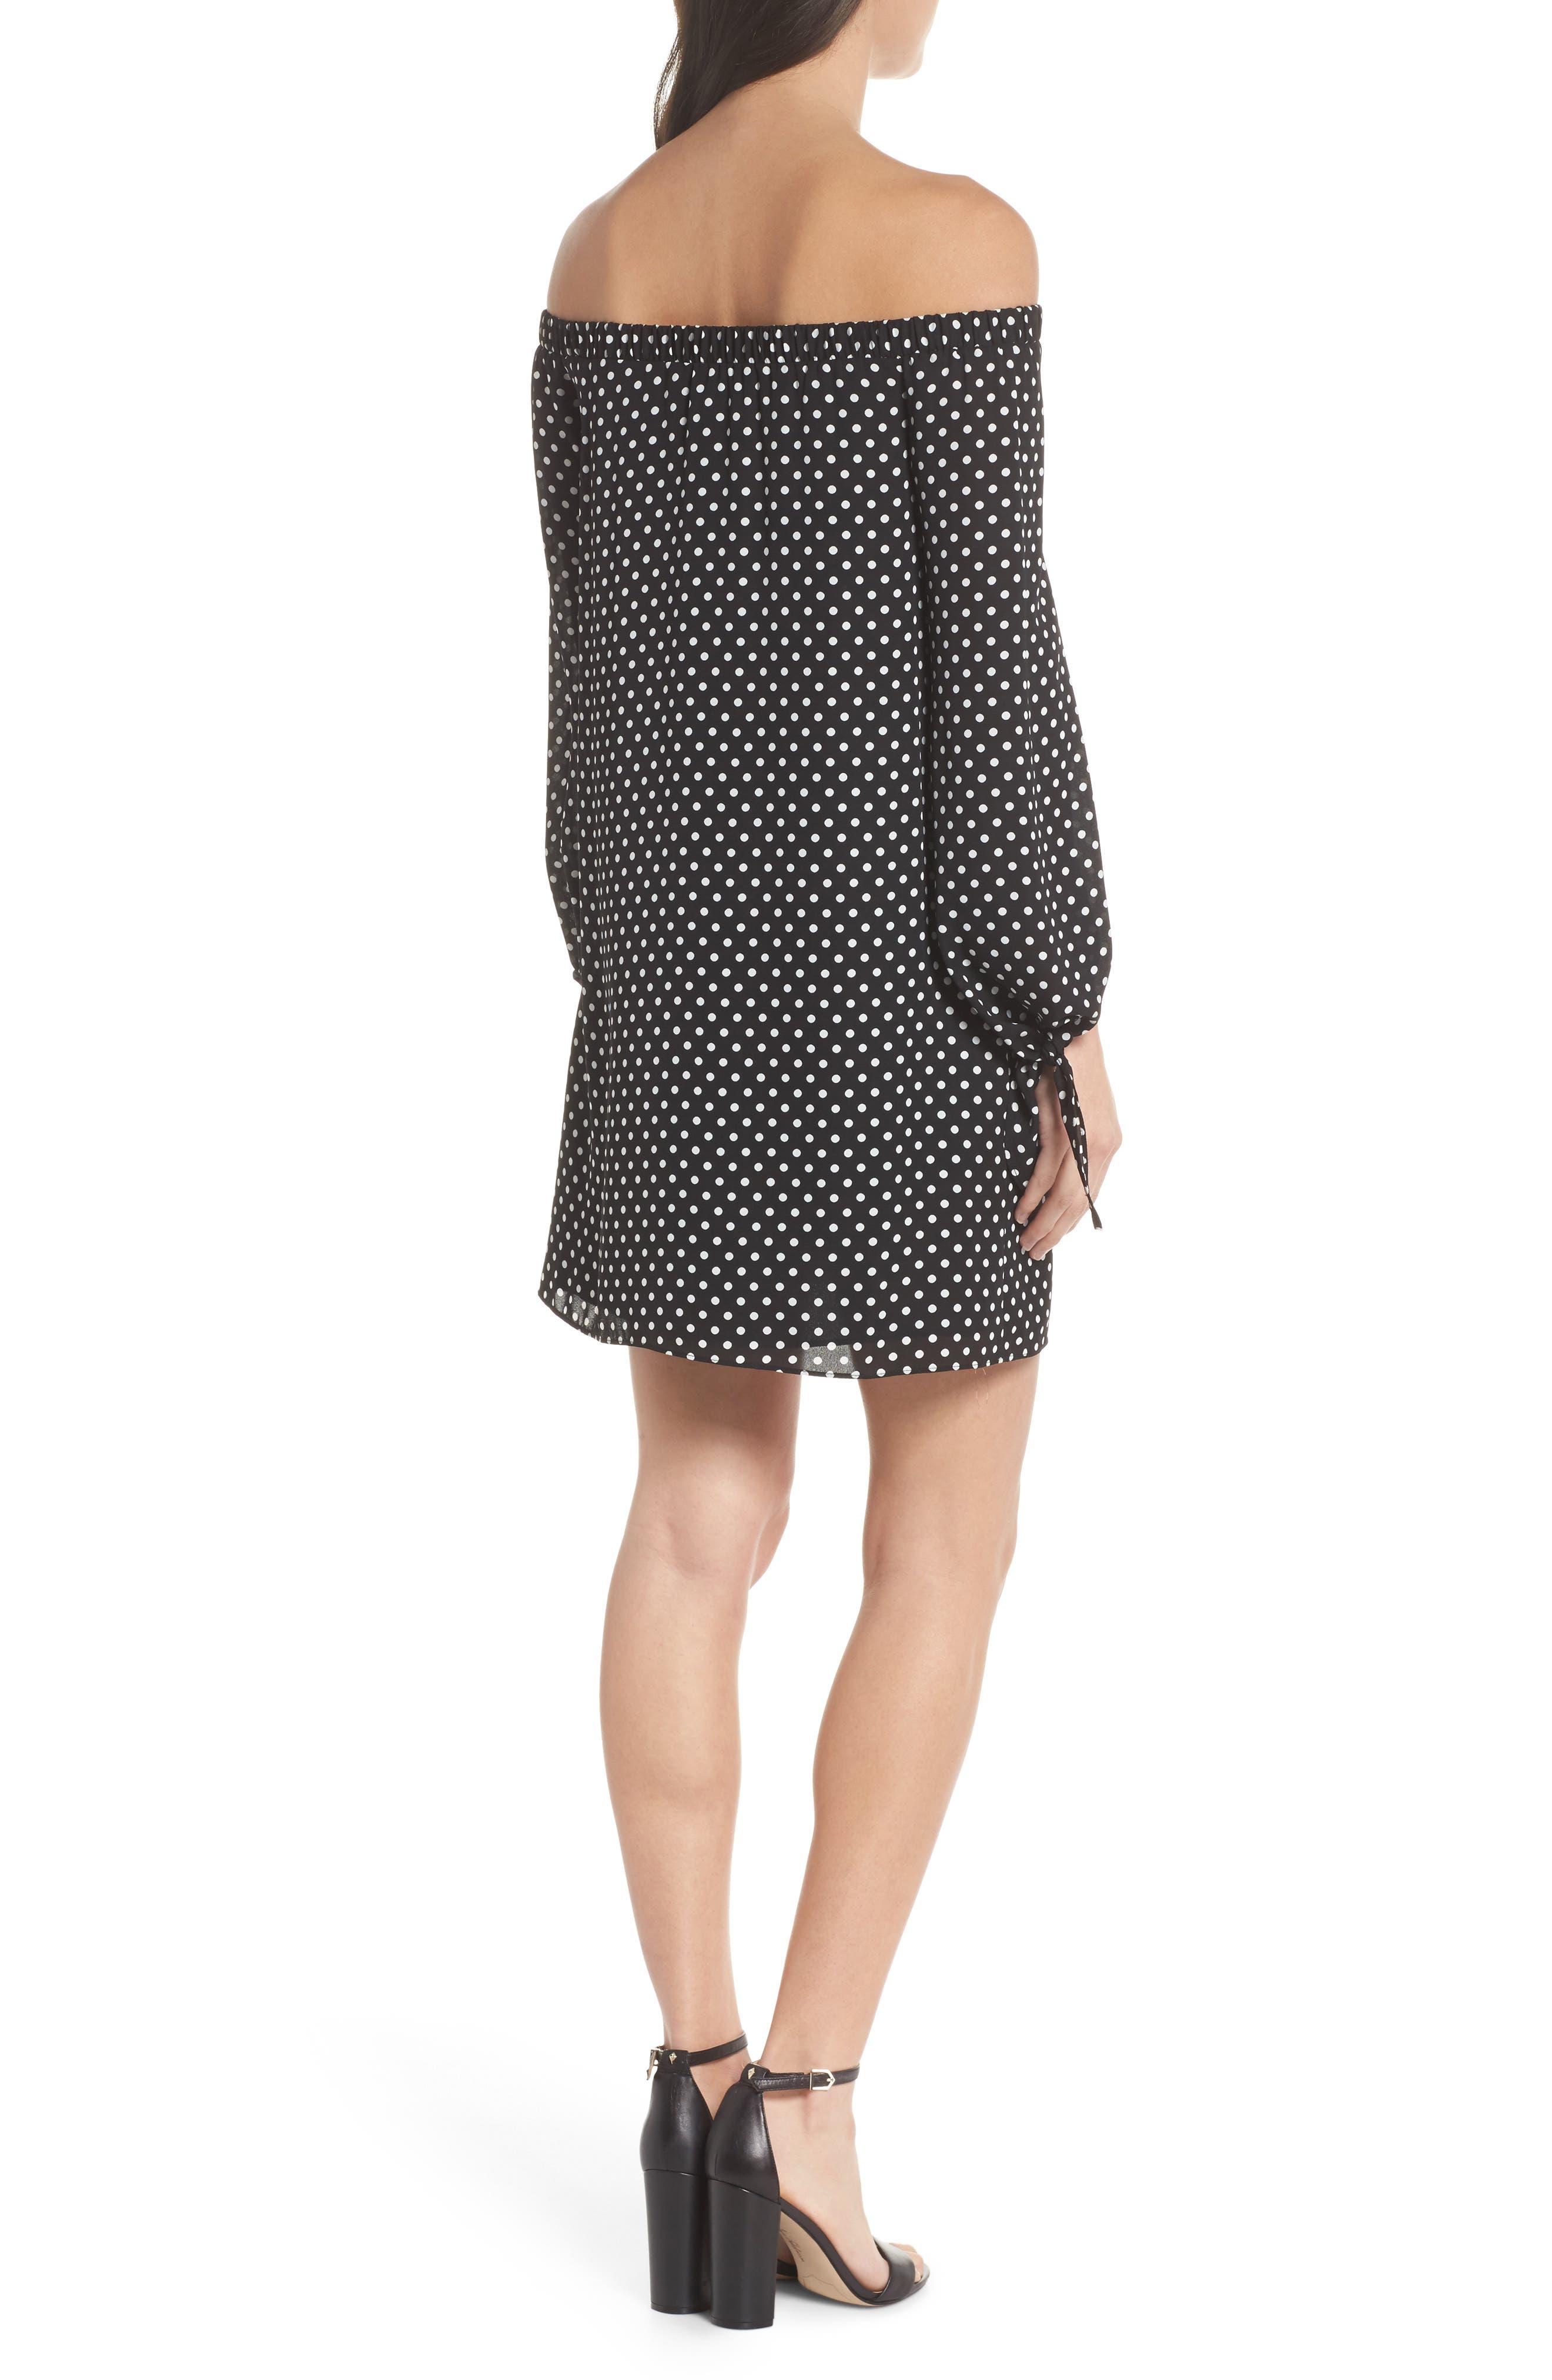 Polka Dot Off the Shoulder Minidress,                             Alternate thumbnail 2, color,                             Black/ White